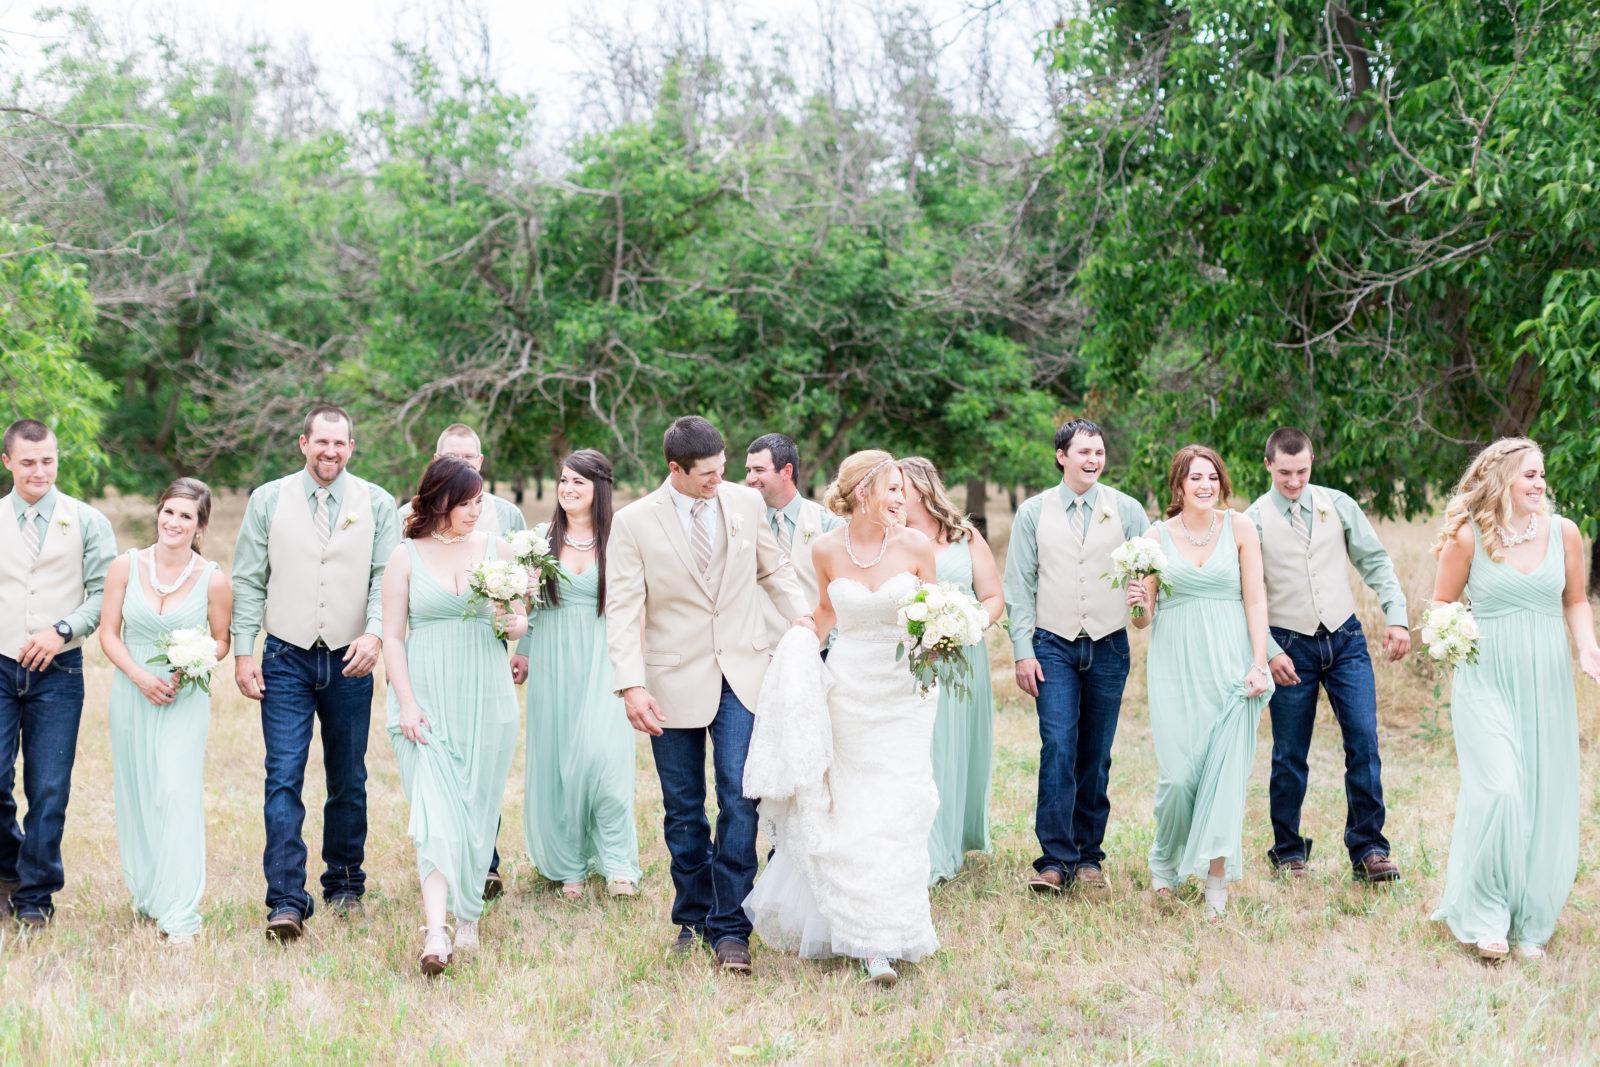 Gover-Ranch-wedding-photos-in-barn-3-1600x1067.jpg